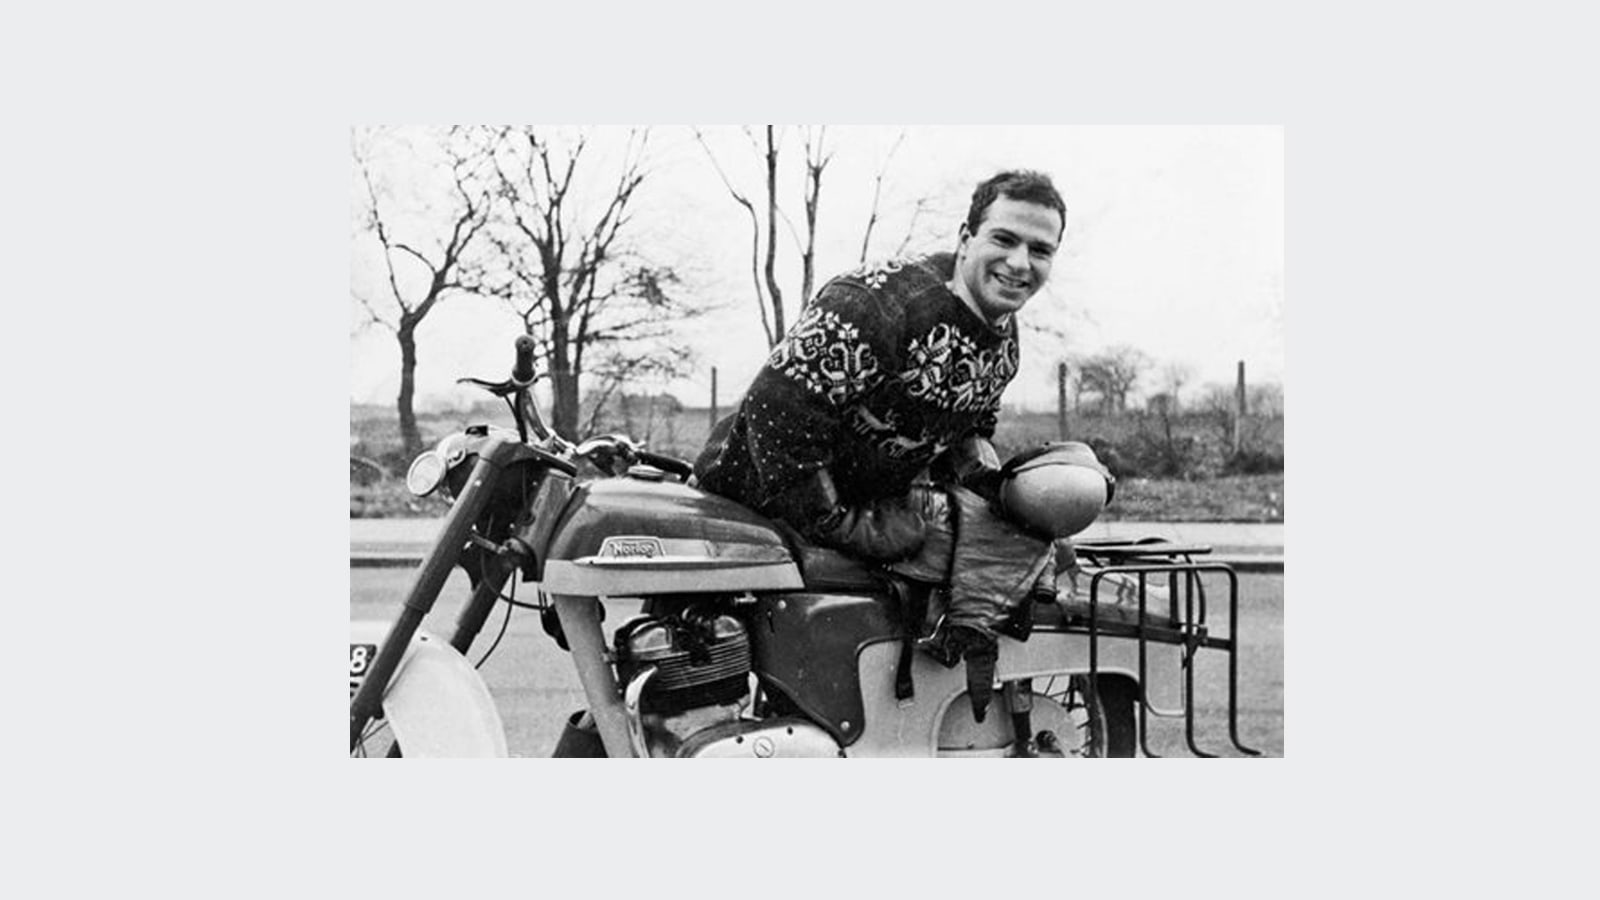 Oliver Sacks on motorbike in 1964